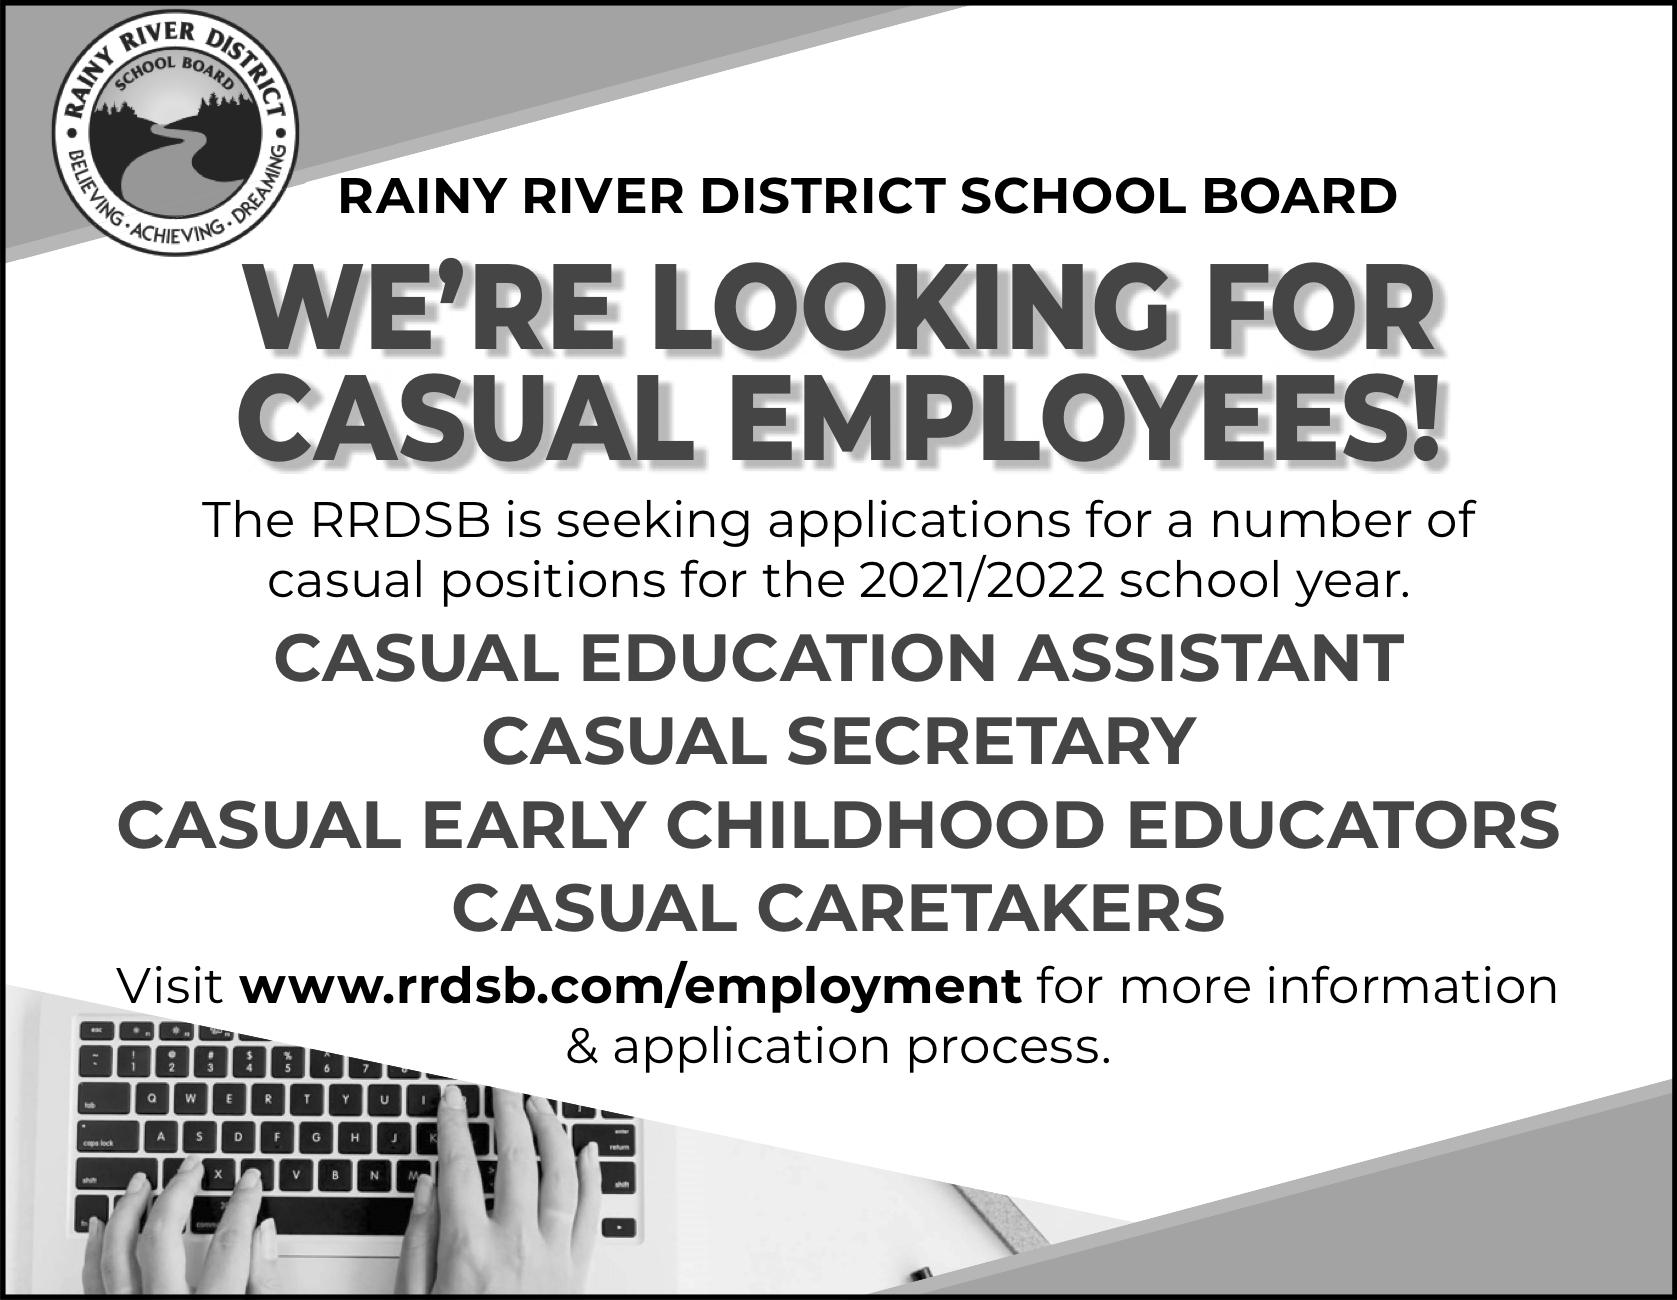 RRDSB Casual Employees